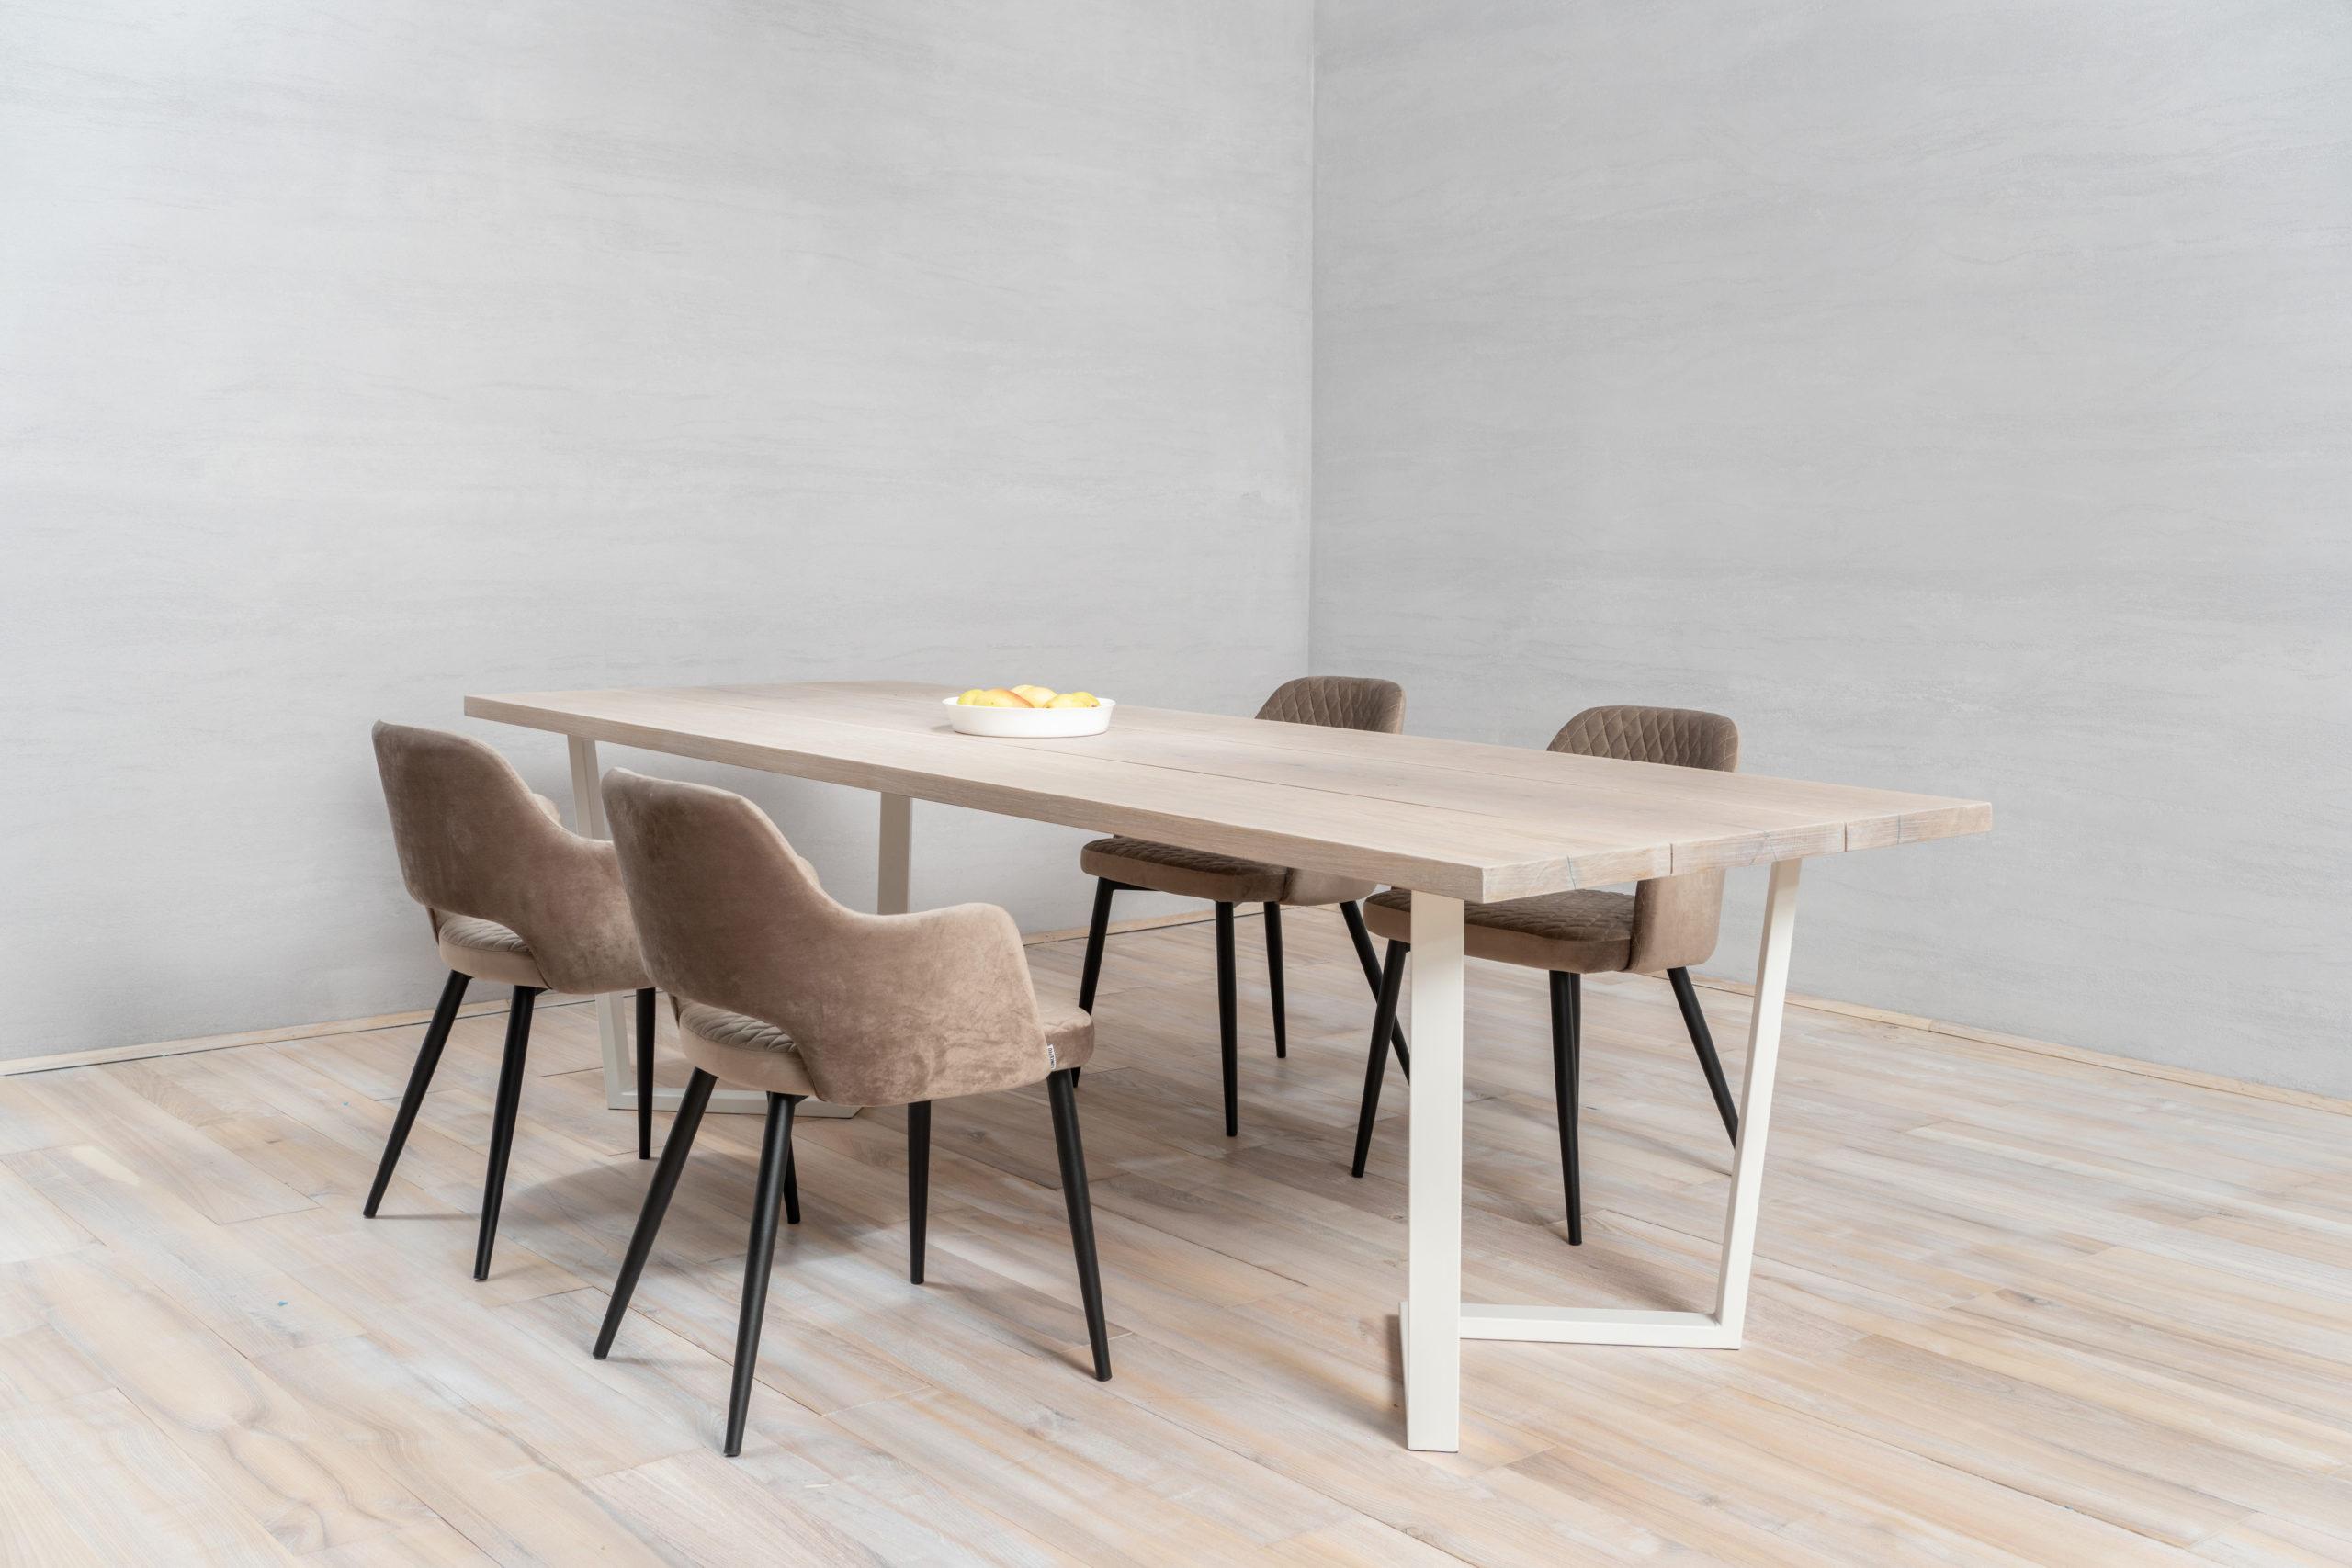 Oak Wood Table Tops 3 planks